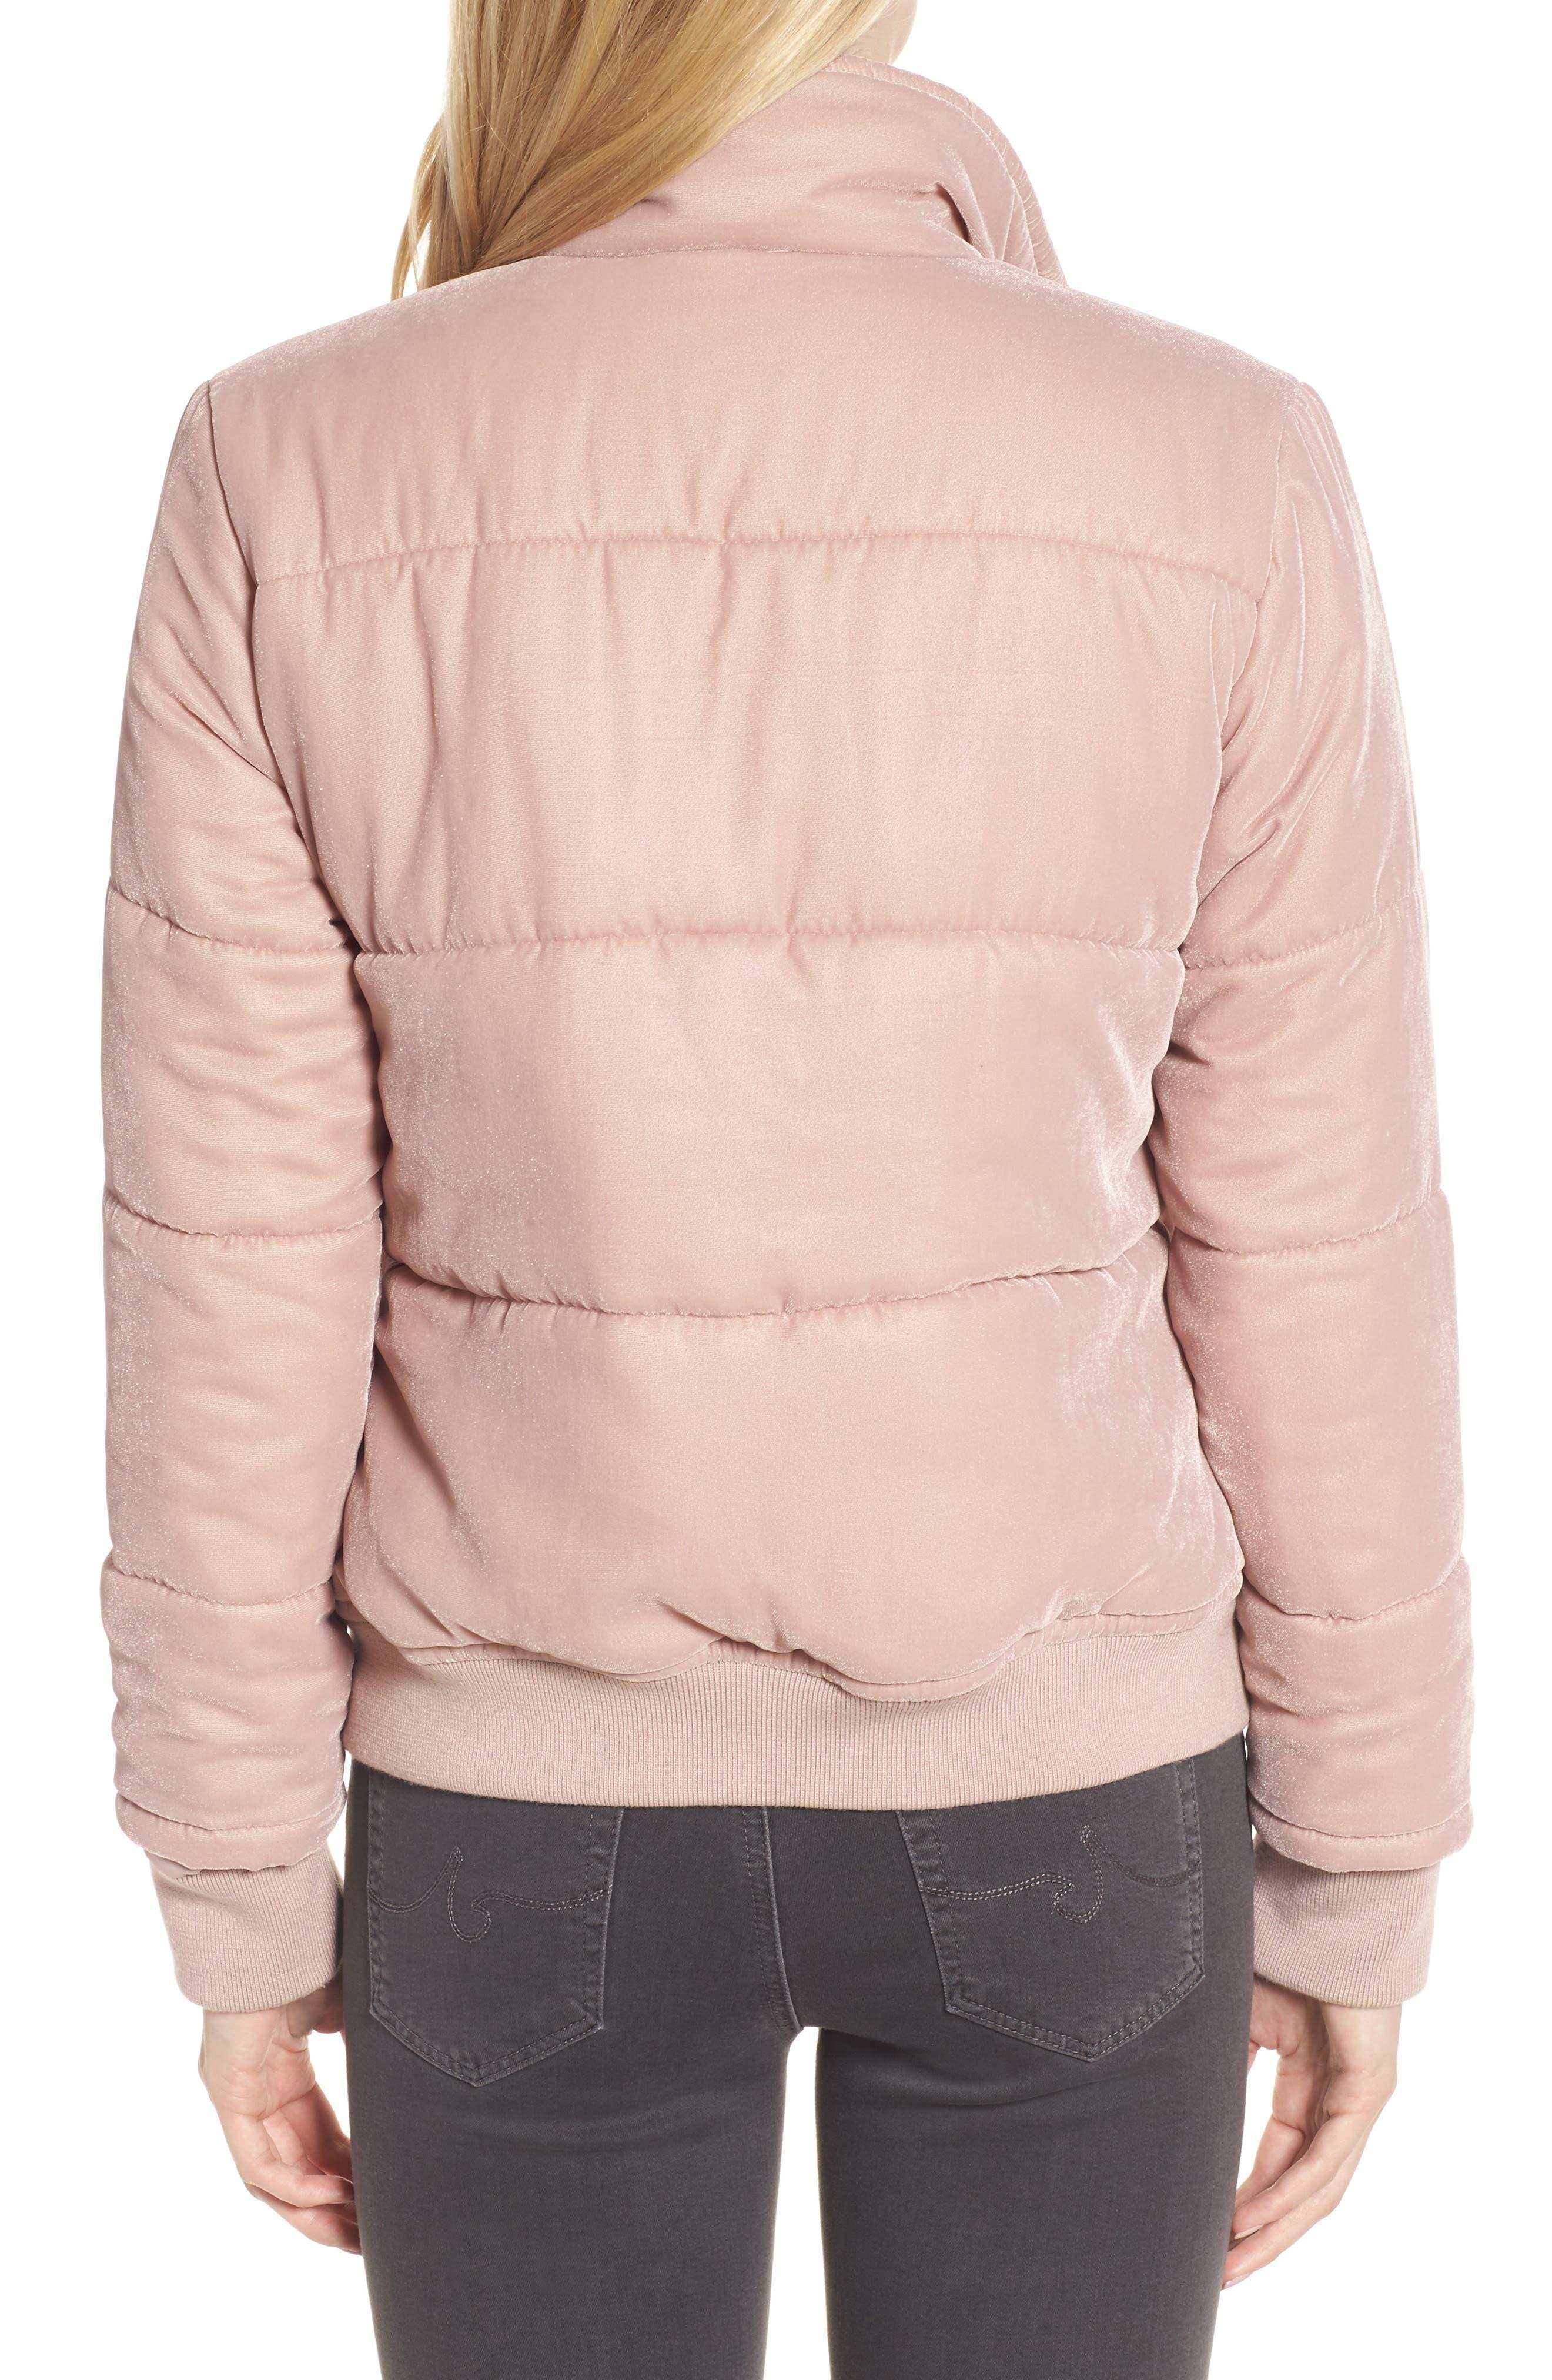 Quilted Velvet Jacket,                             Alternate thumbnail 2, color,                             Pink Adobe